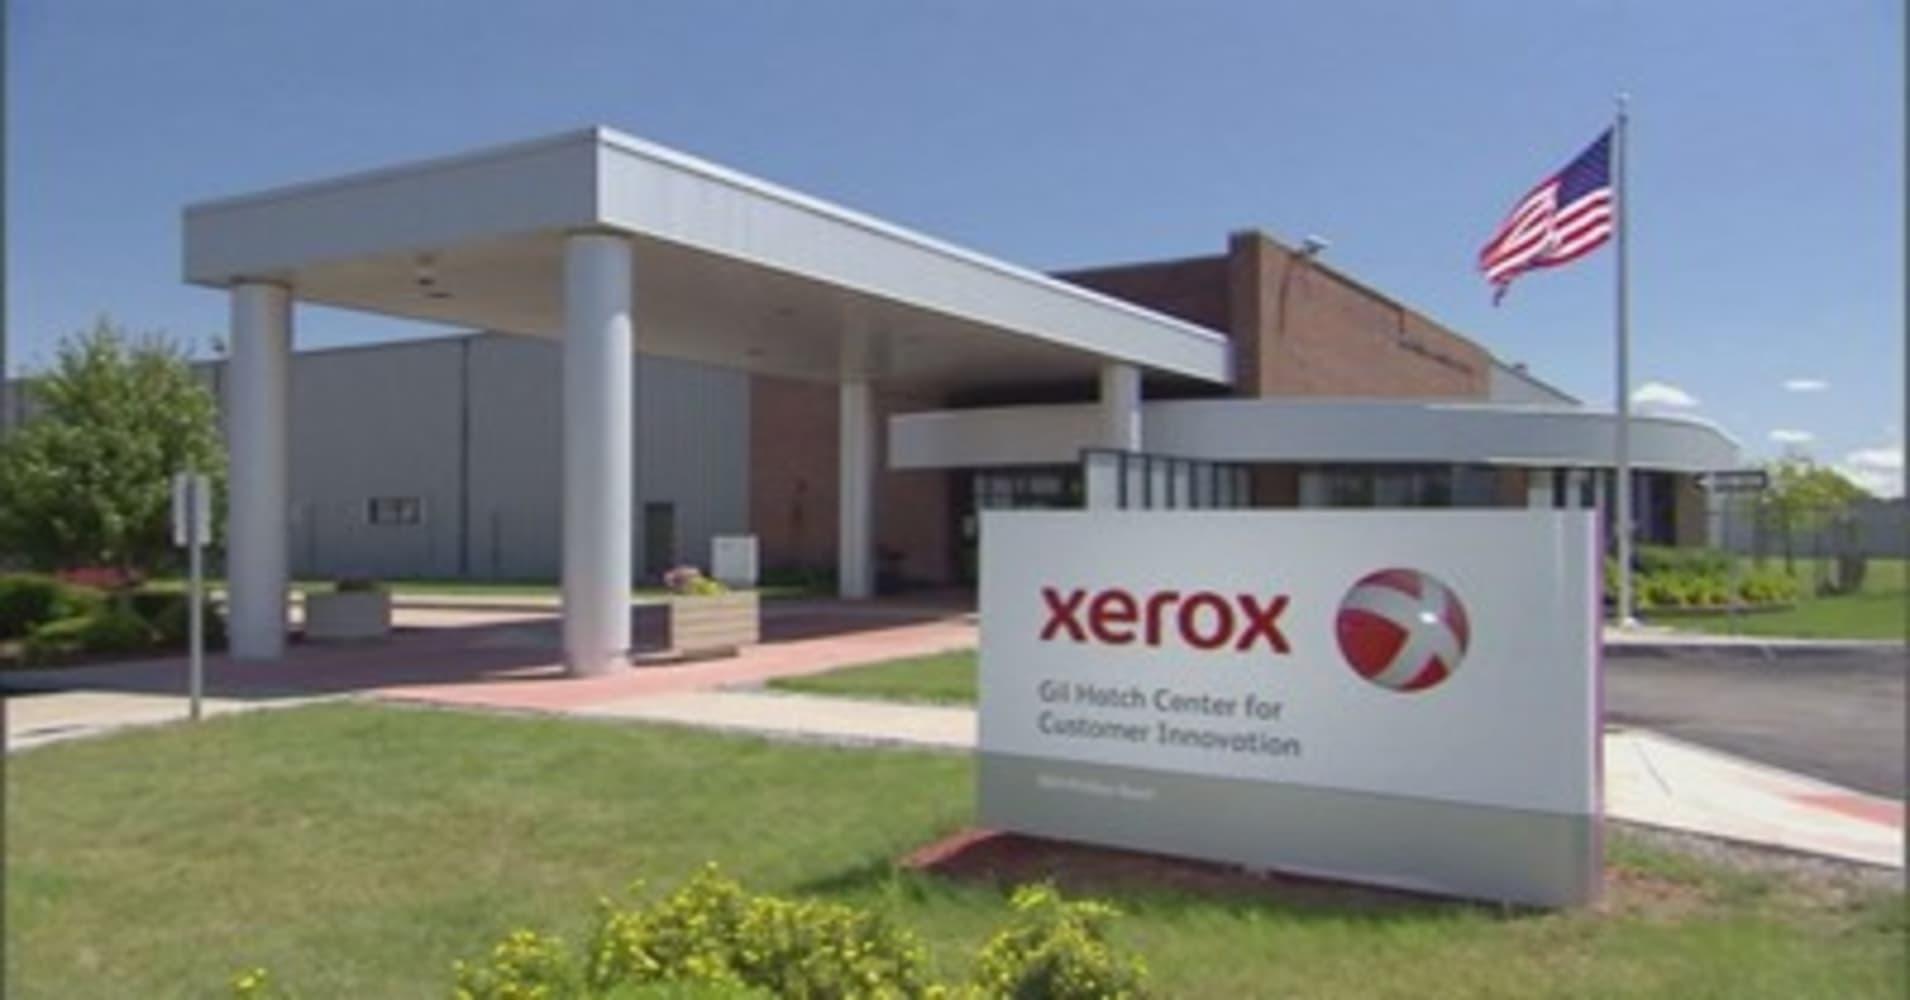 Japan's Fujifilm is set to take over Xerox in a 6 1 billion dollar deal